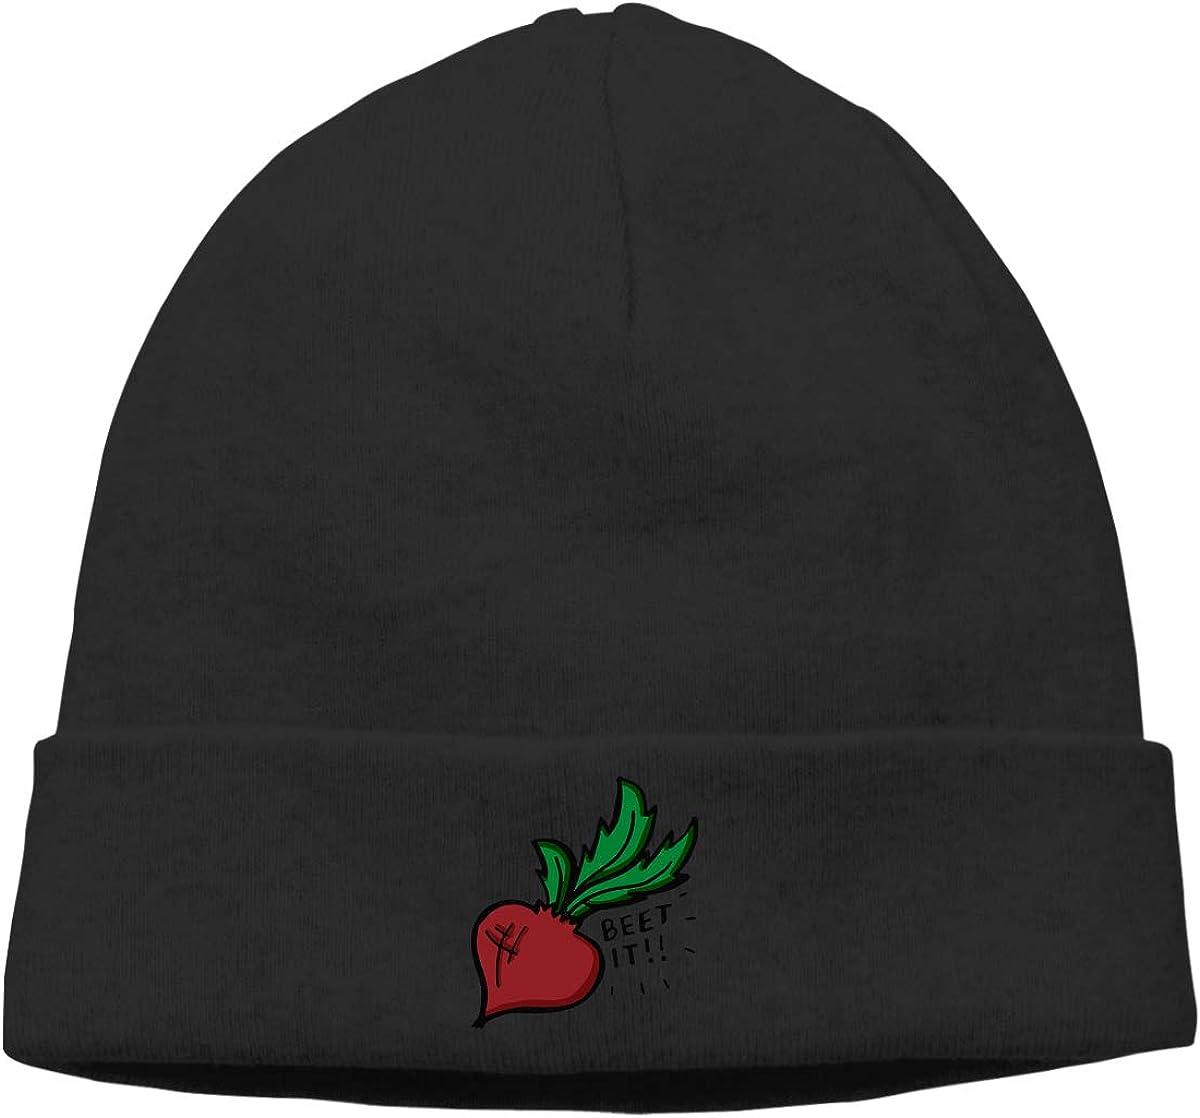 American Flag Thank You Veterans Beanie Cap Hat Men /& Women Knitting Hats Stretchy /& Soft Beanie